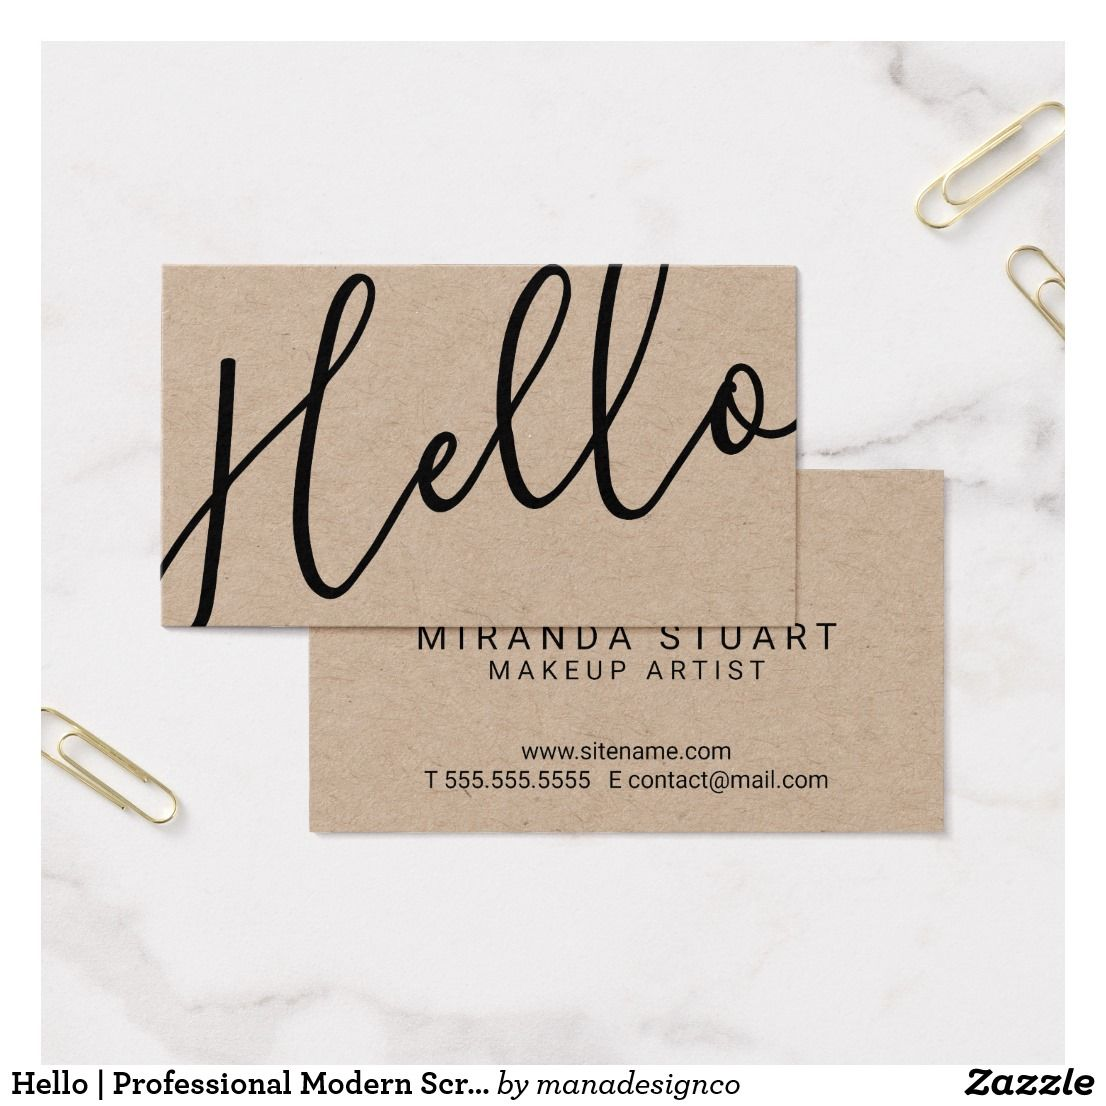 Hello professional modern script kraft paper business card hello professional modern script kraft paper business card colourmoves